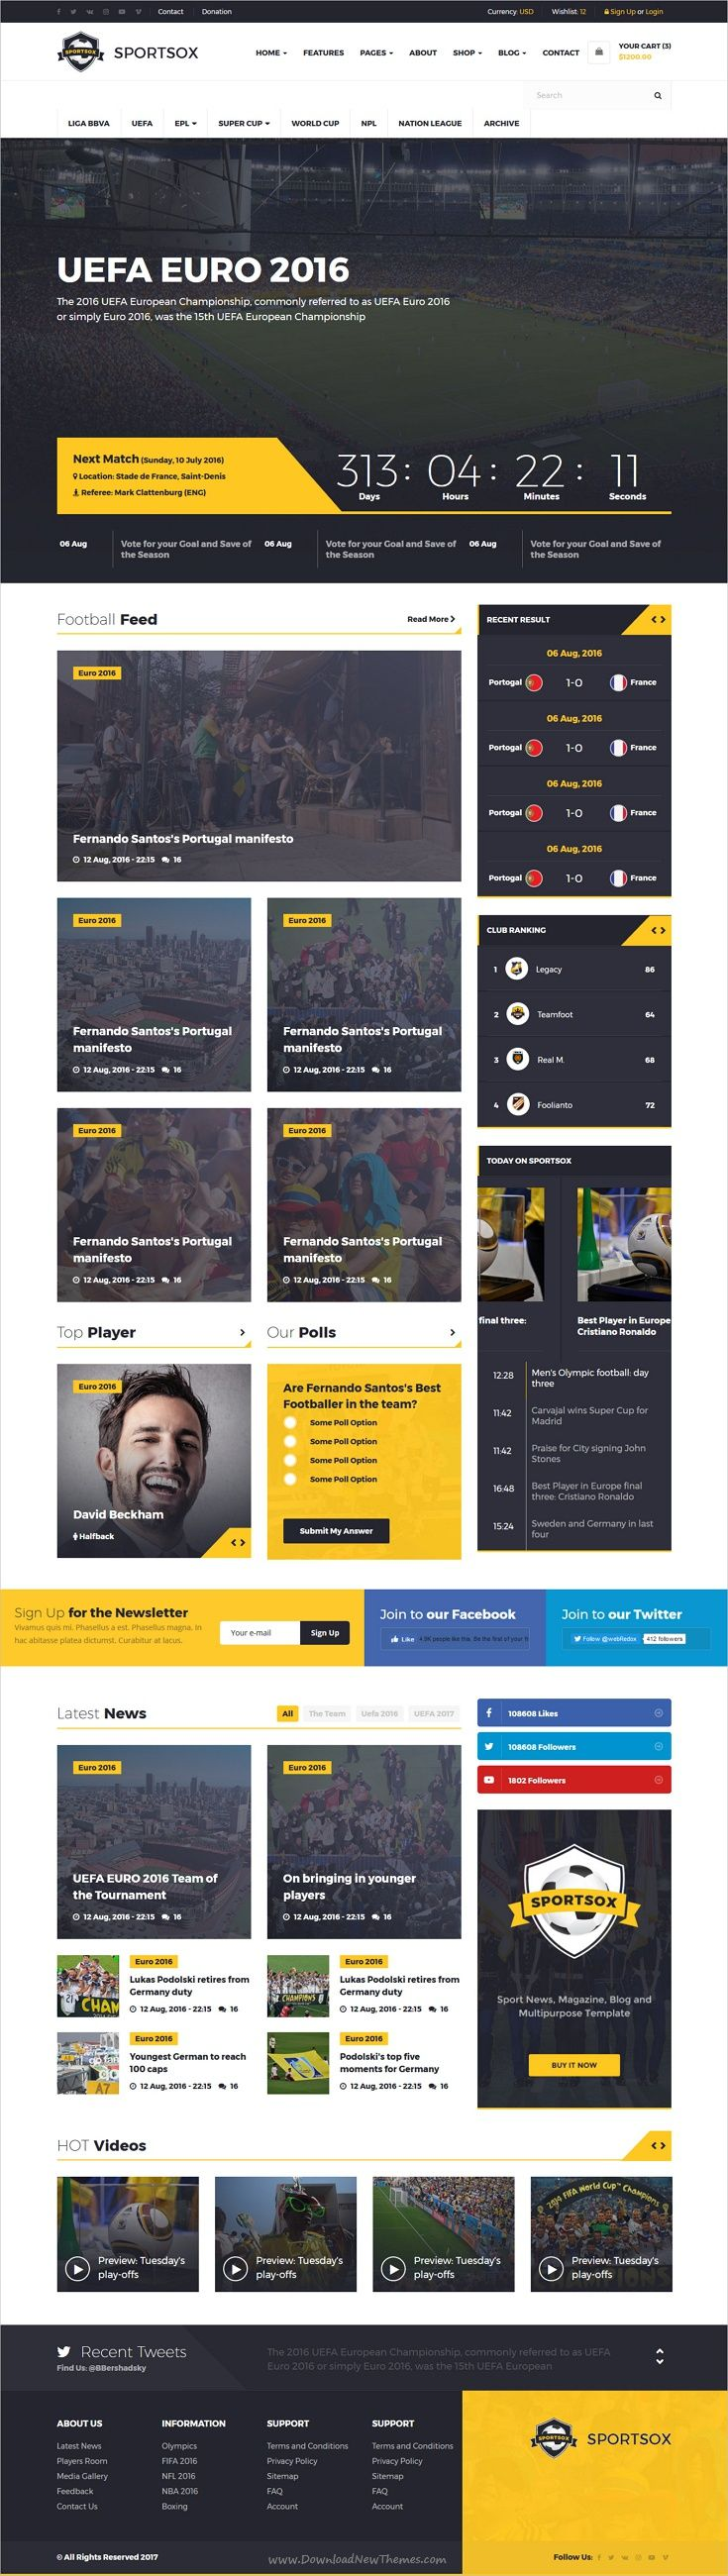 Sportsox | Sport Team Clubs HTML Template | Template, Ui design and ...